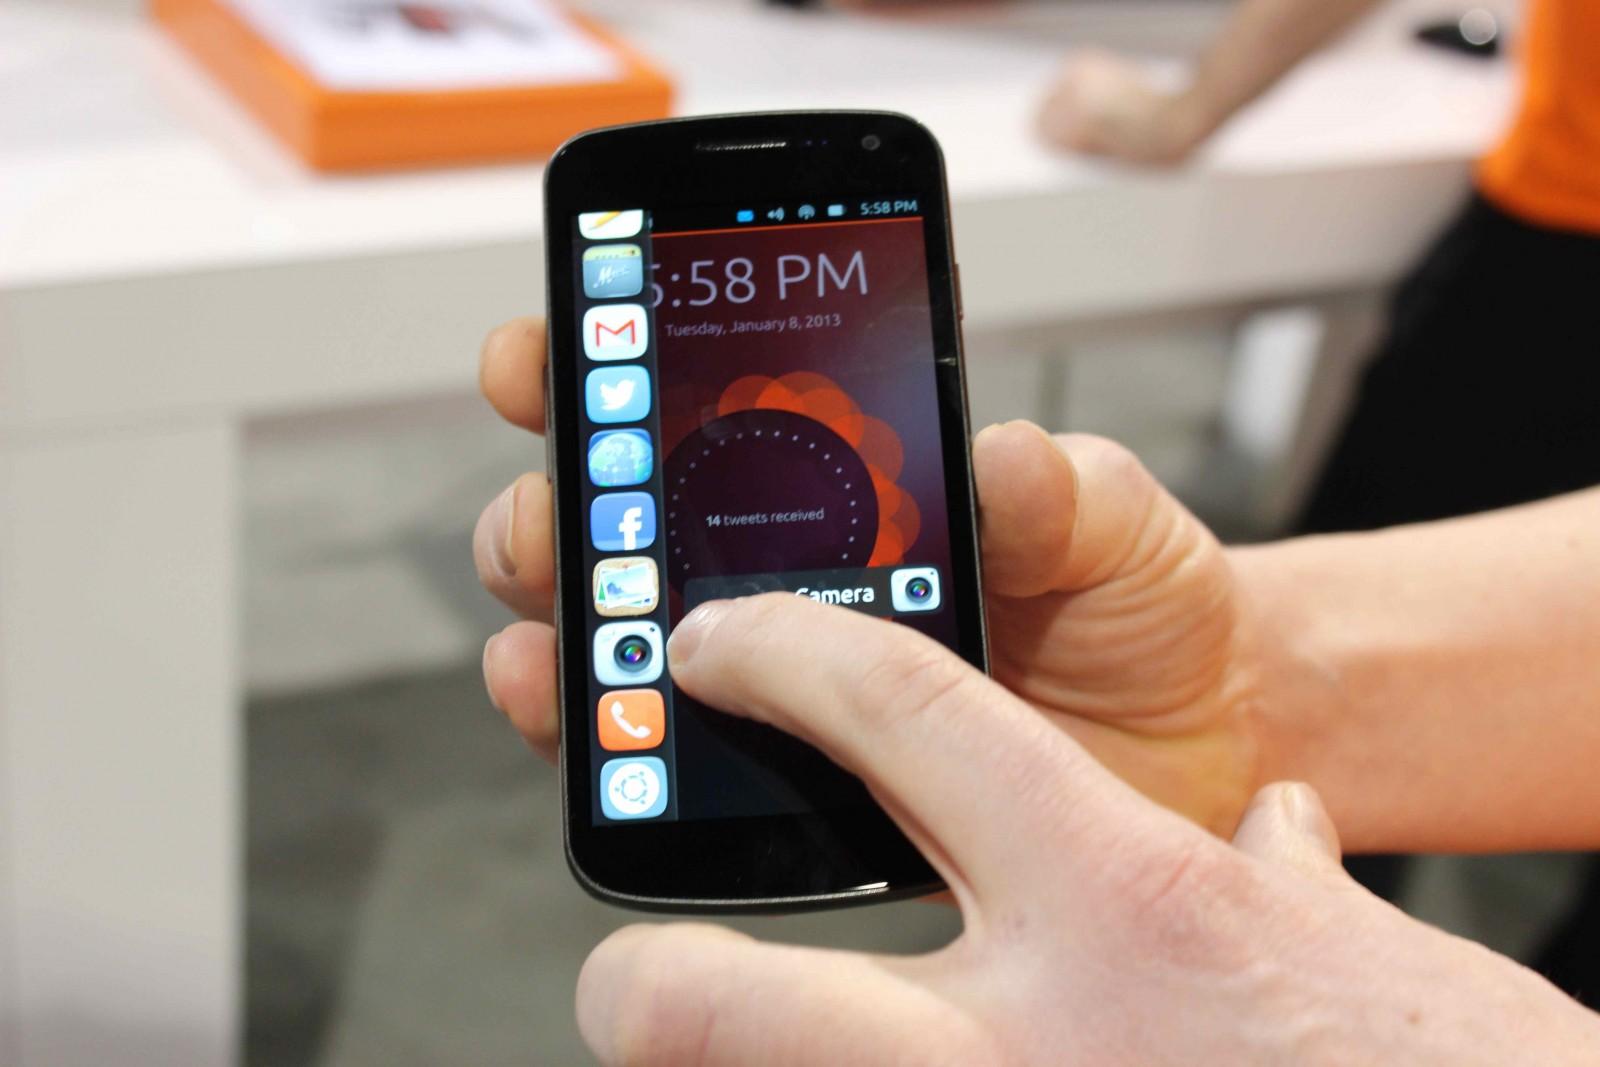 Ubuntu on a Nexus phone.